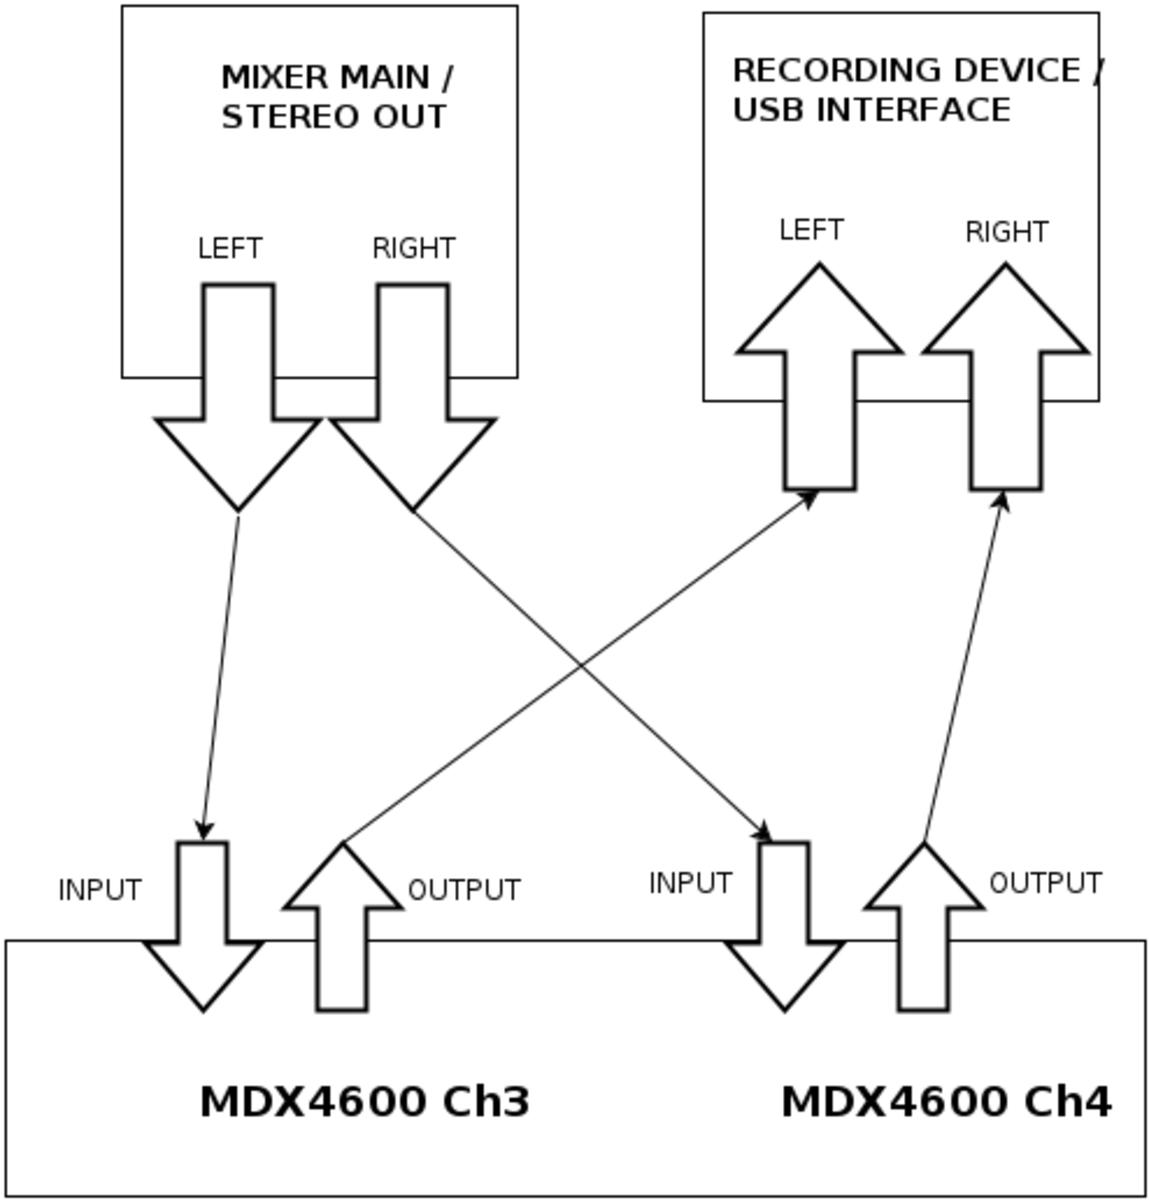 Behringer MDX4600 setup for podcasting